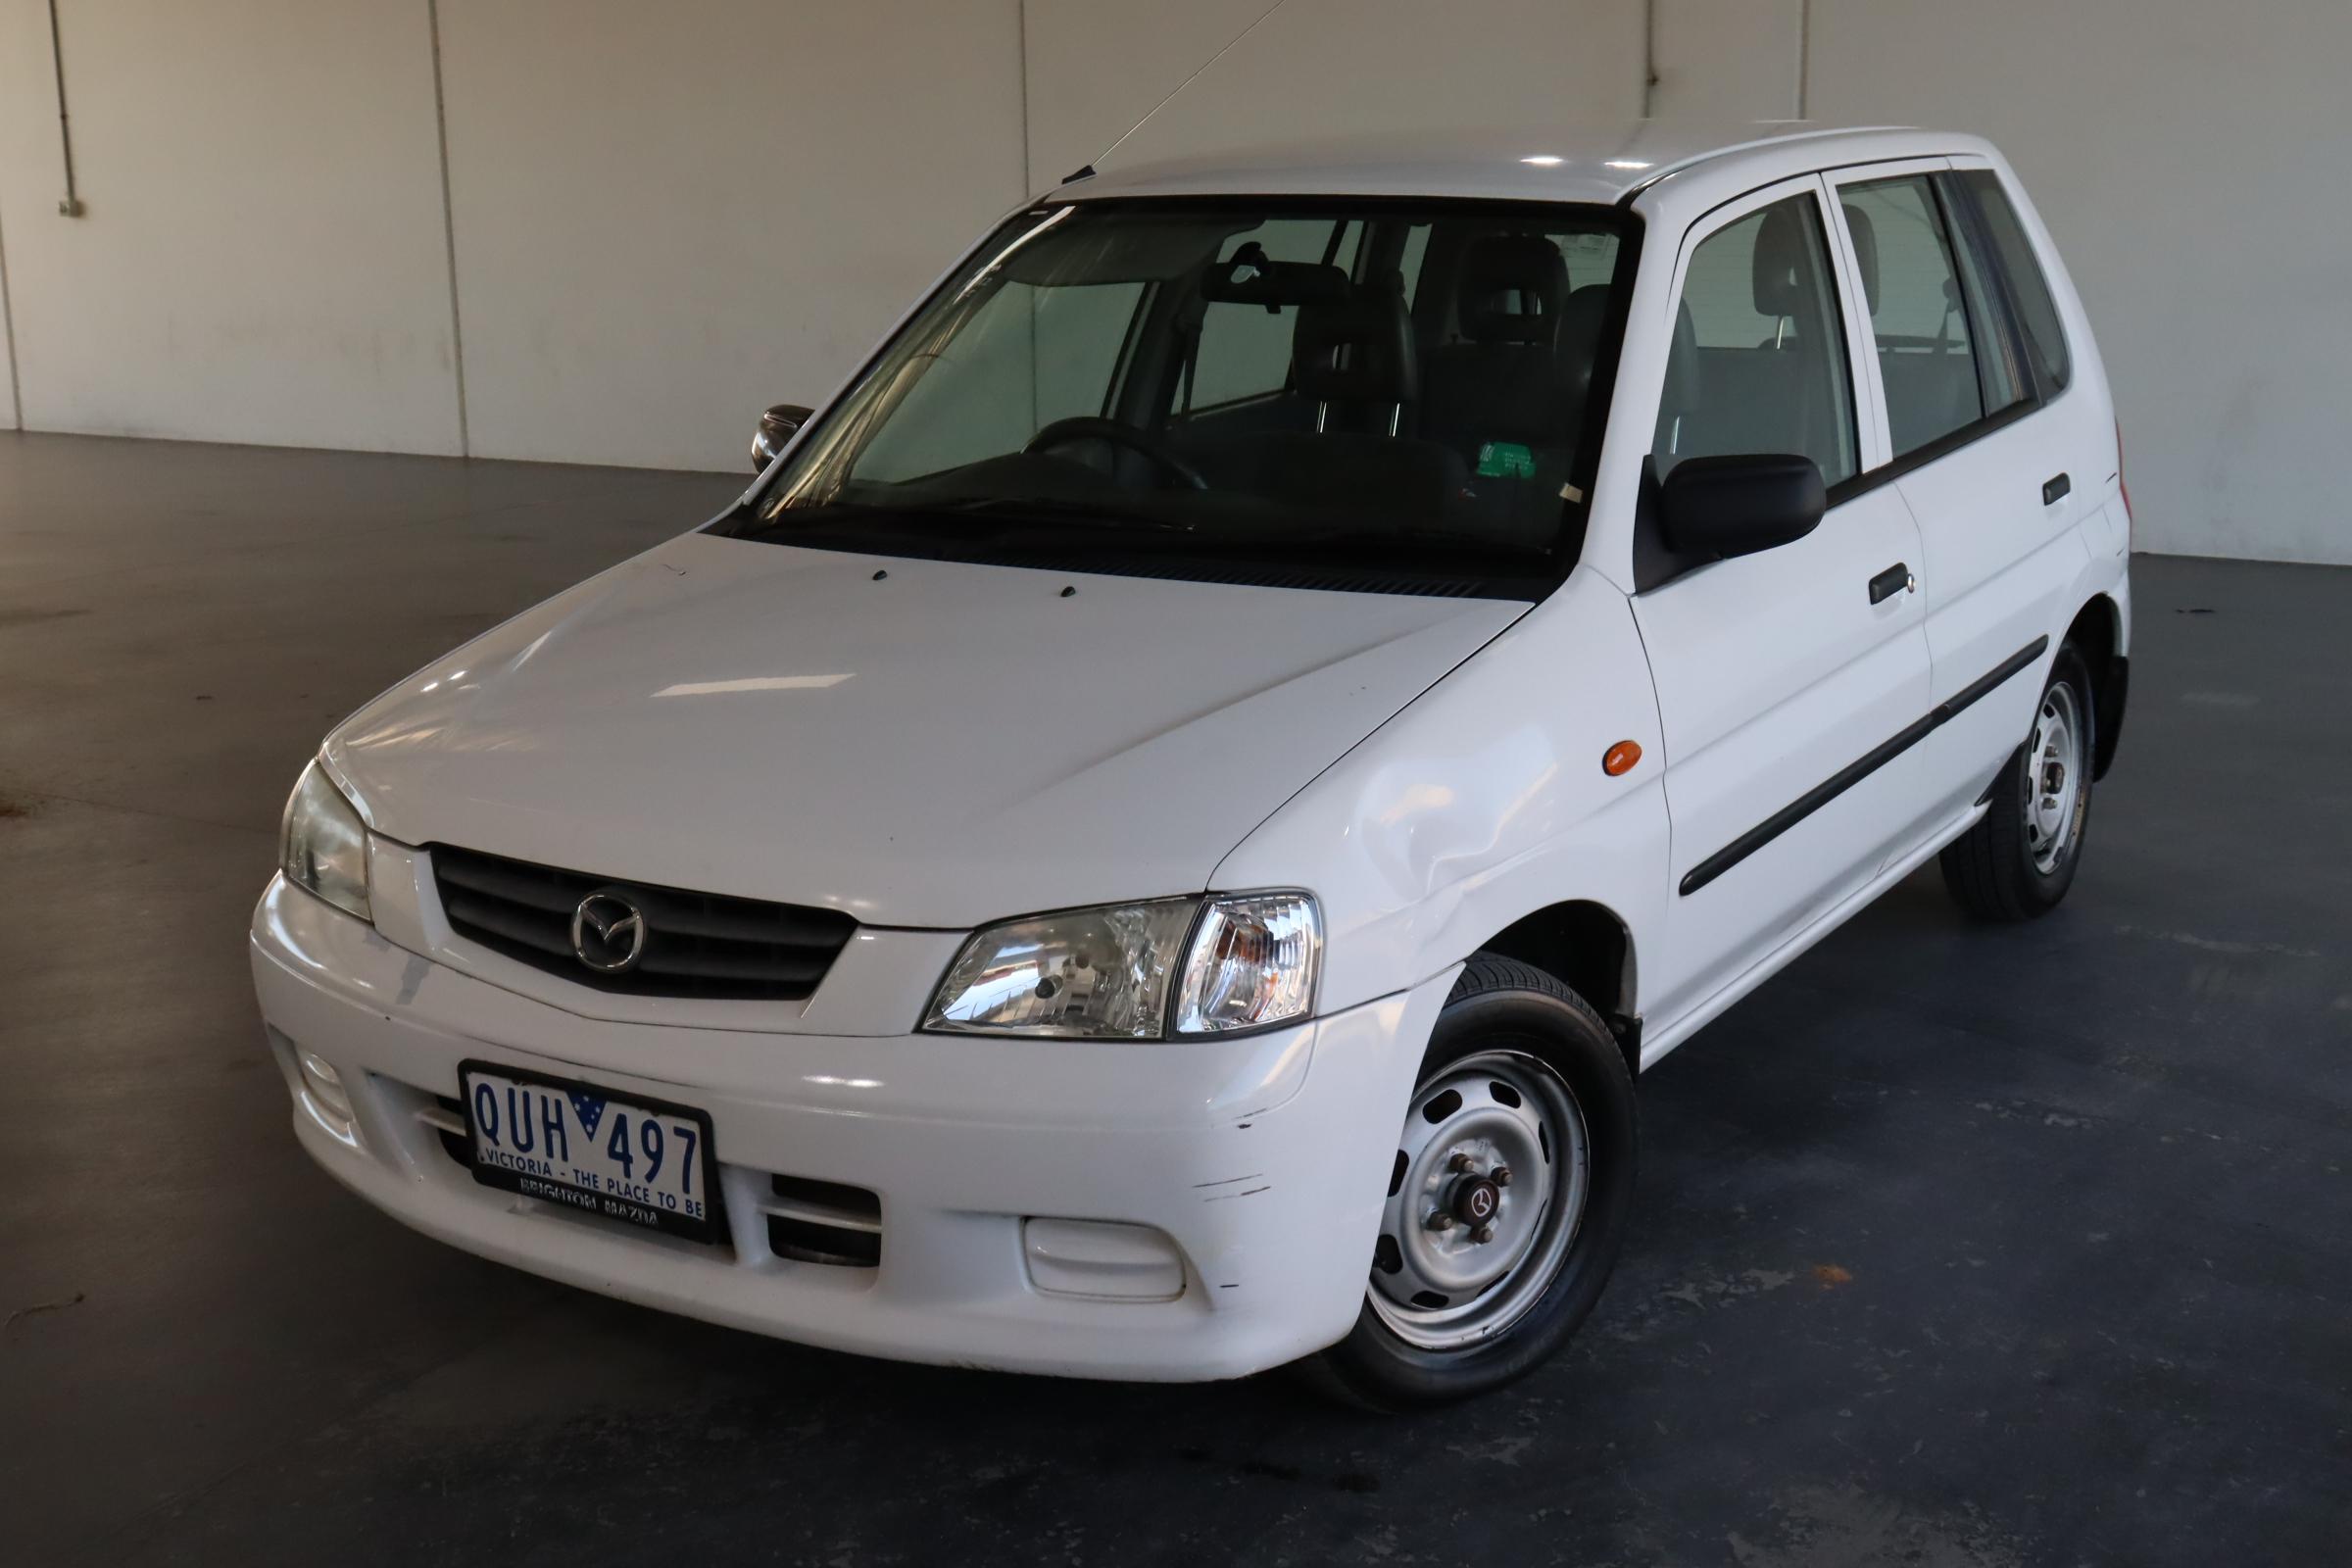 2001 Mazda 121 Metro Shades 118696kms Automatic Hatchback